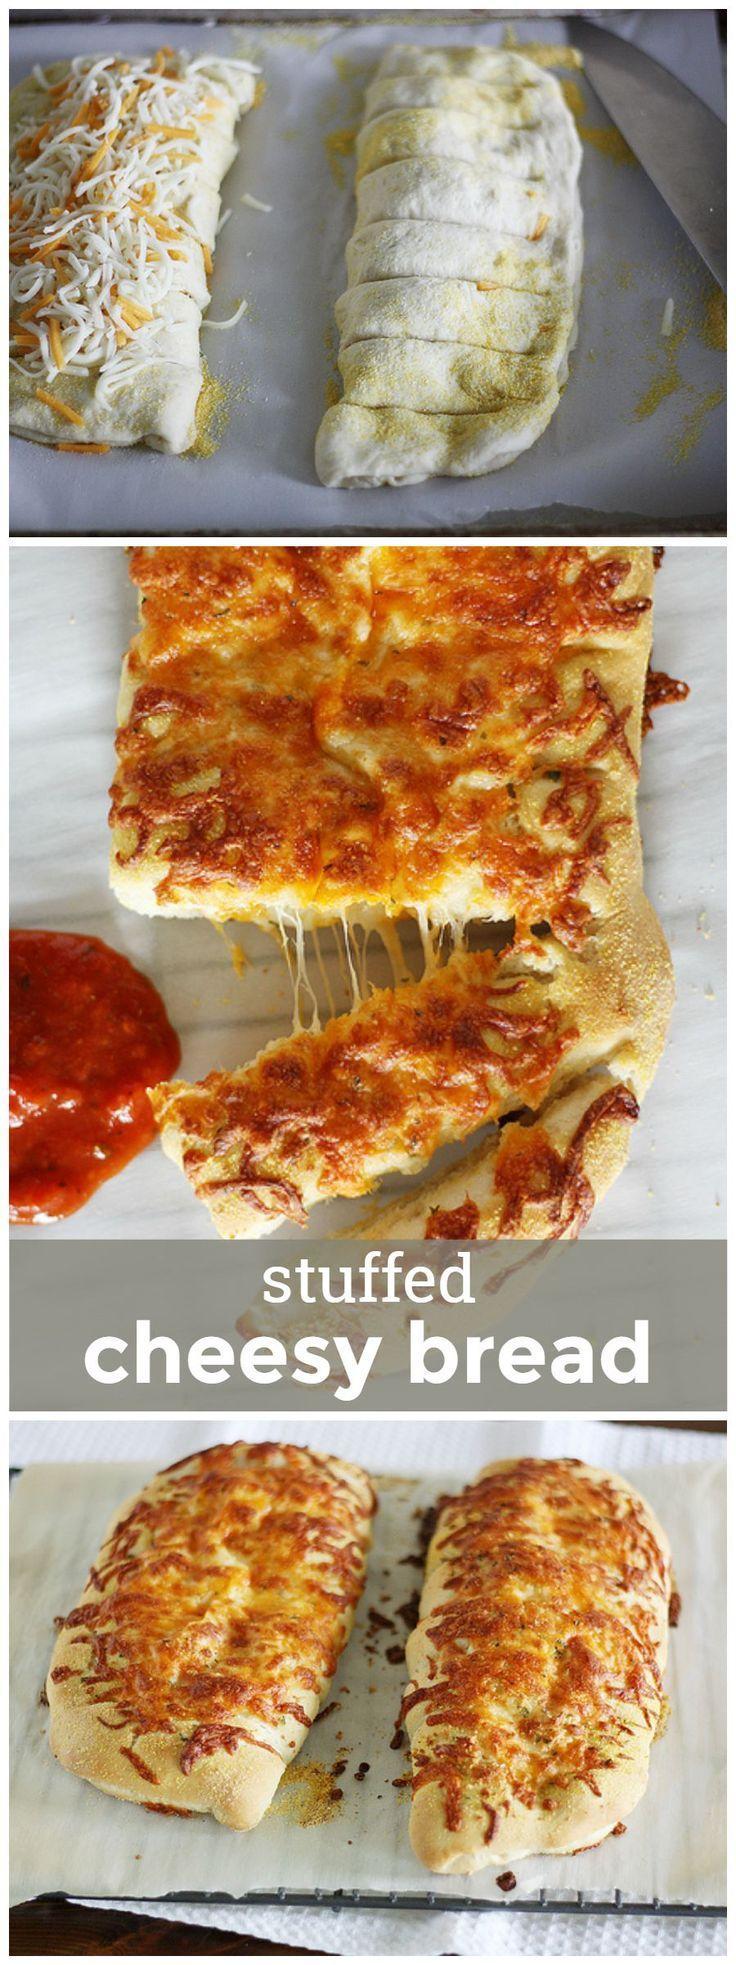 Stuffed Cheesy Bread Cheesy bread recipe, Food, Food recipes